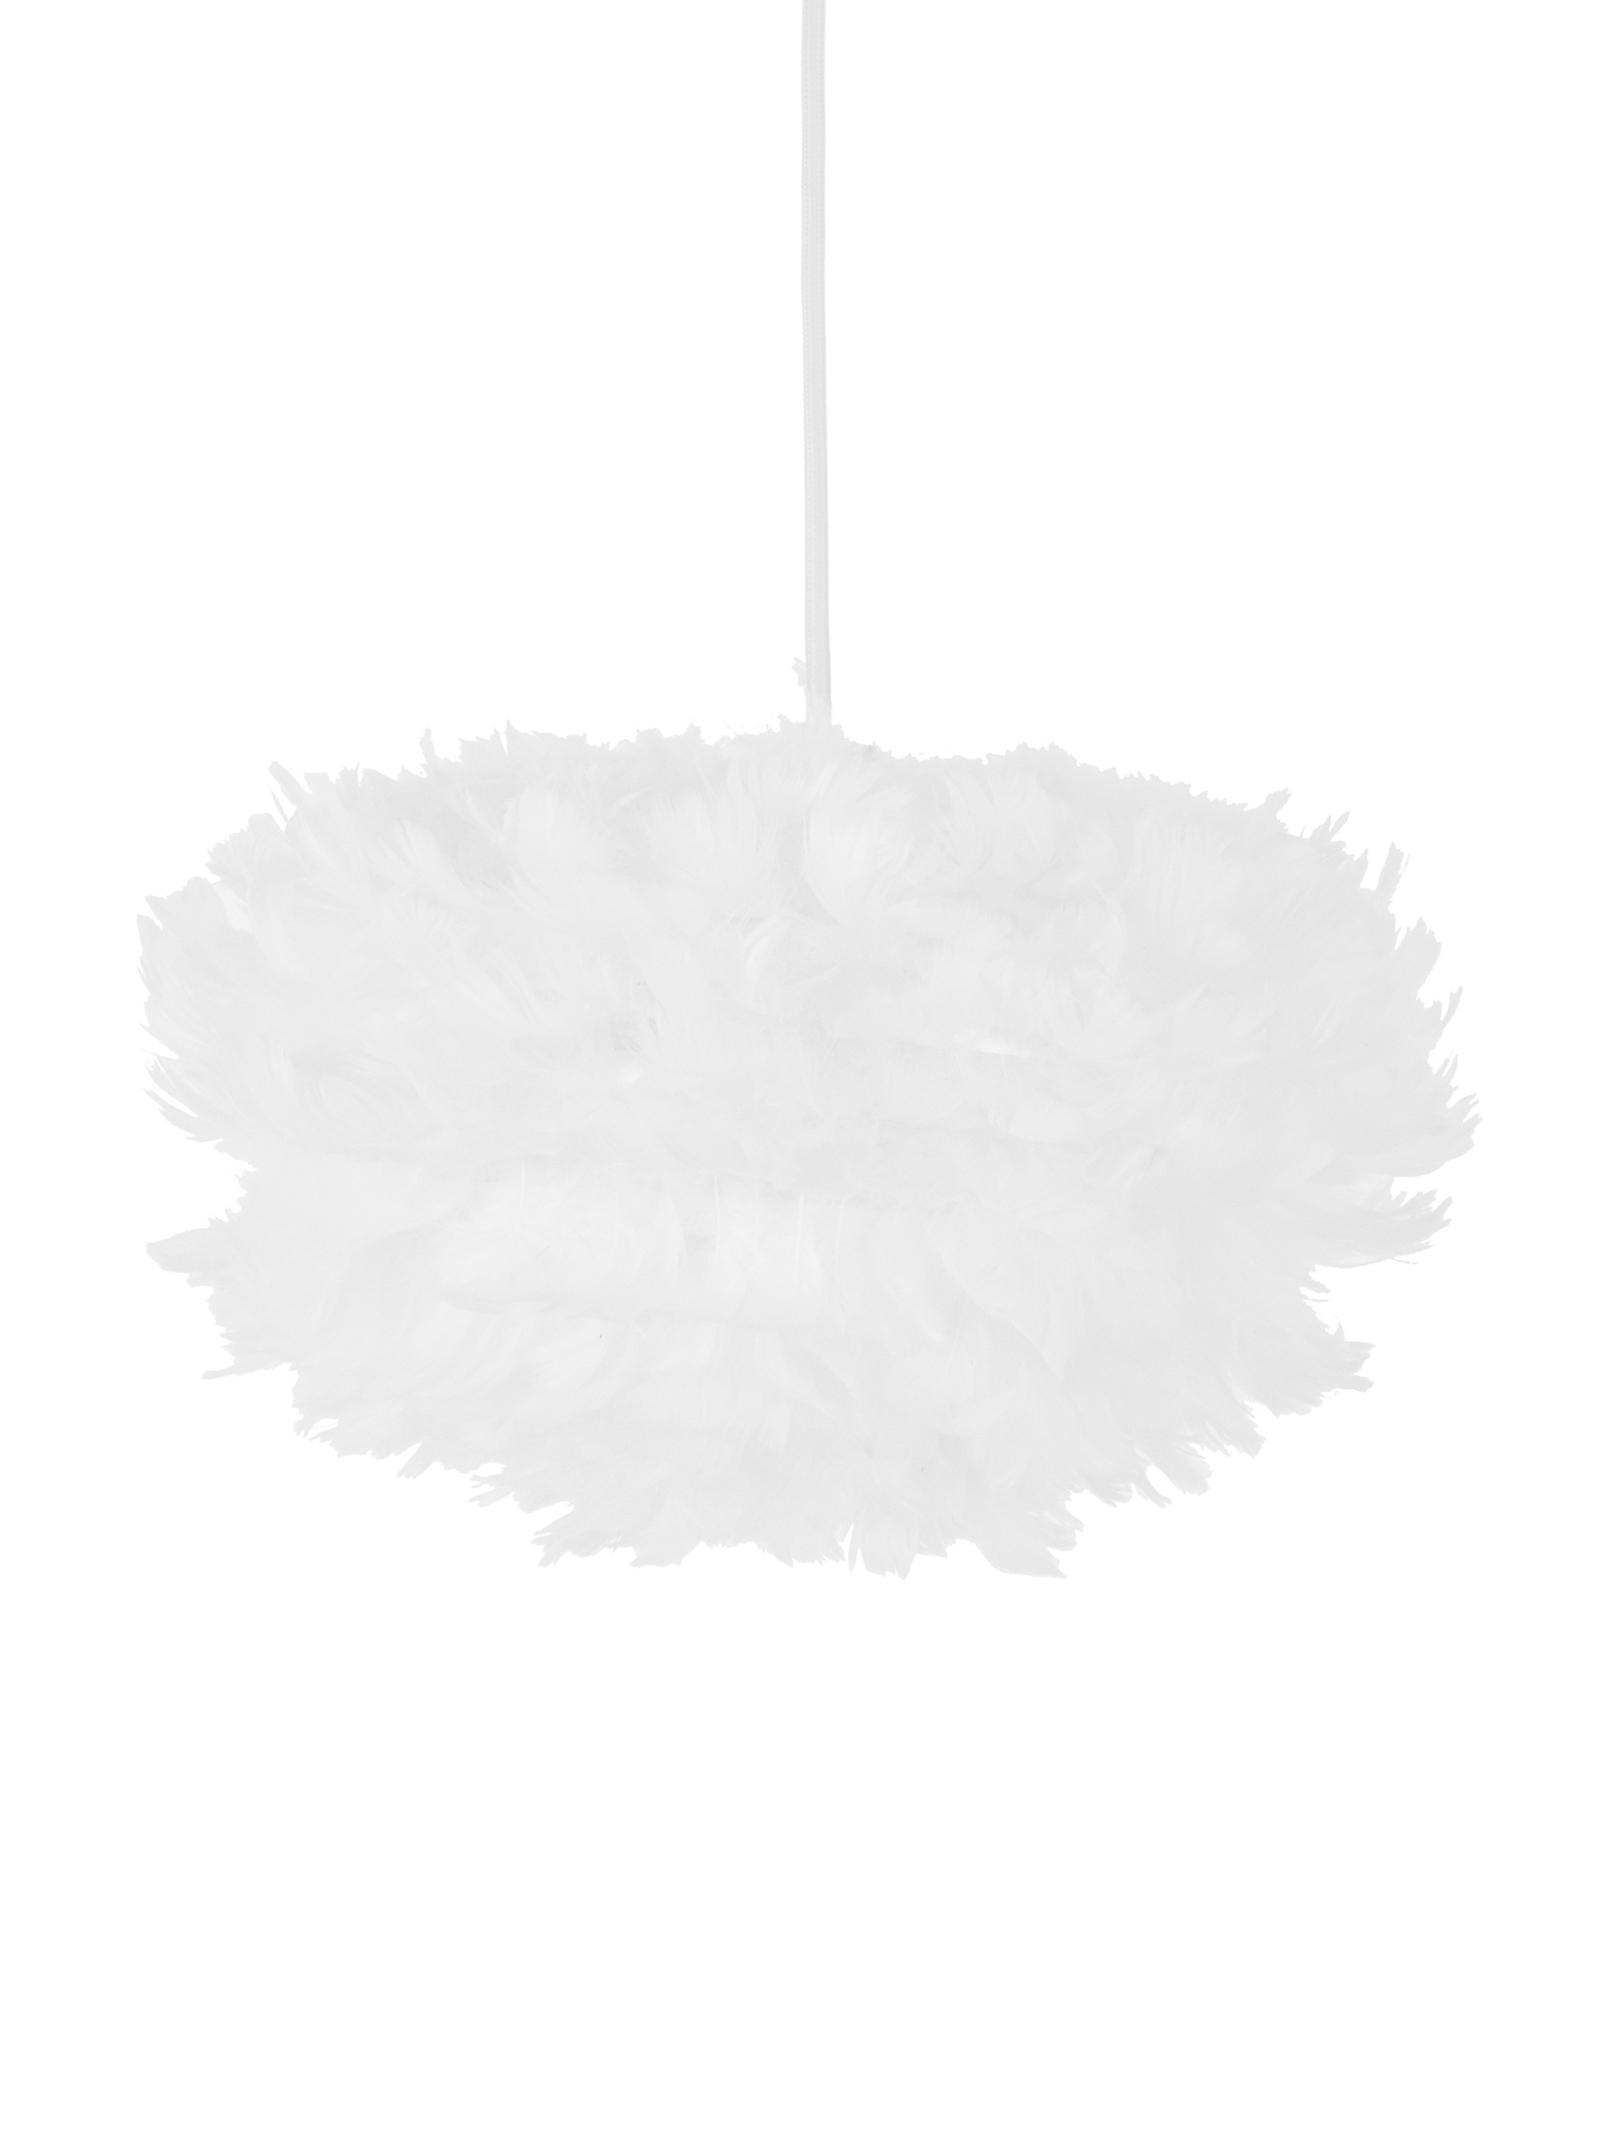 Lampada a sospensione in piume Eos, Paralume: piuma d'oca, acciaio, Baldacchino: materiale sintetico, Bianco, Ø 32 x Alt. 20 cm